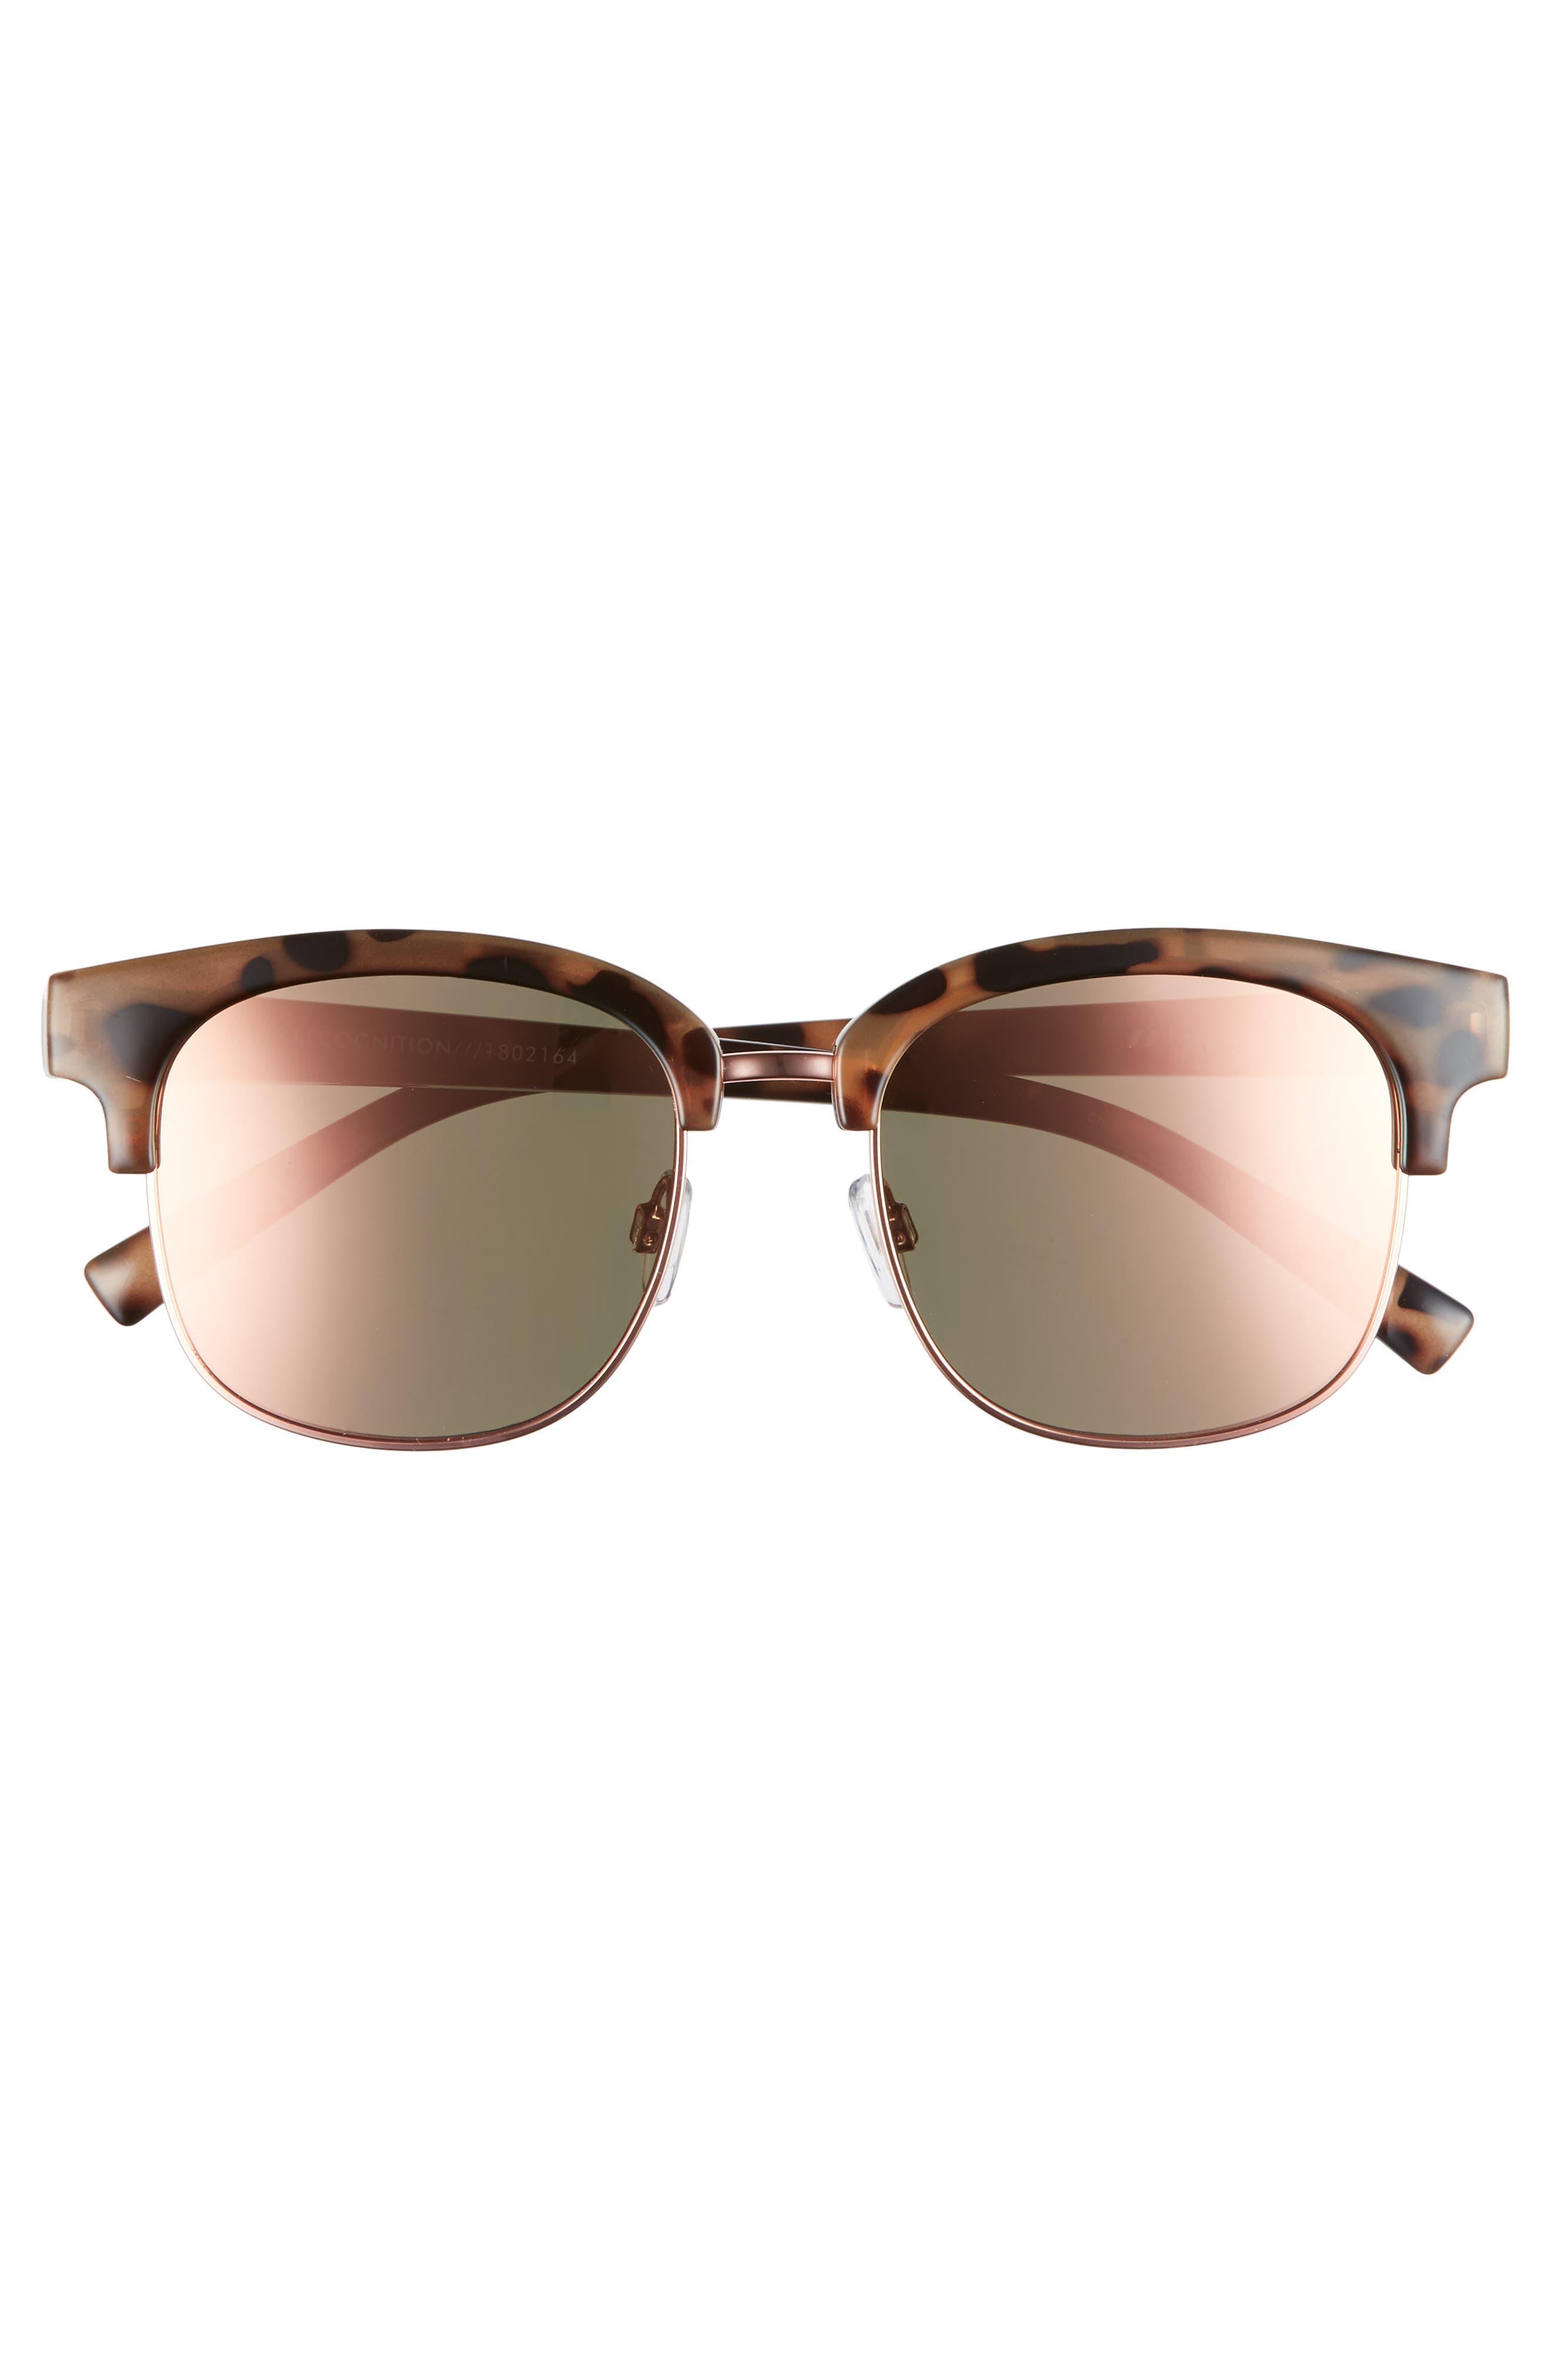 Recognition 53mm Sunglasses,                             Alternate thumbnail 3, color,                             Apricot Tortoise